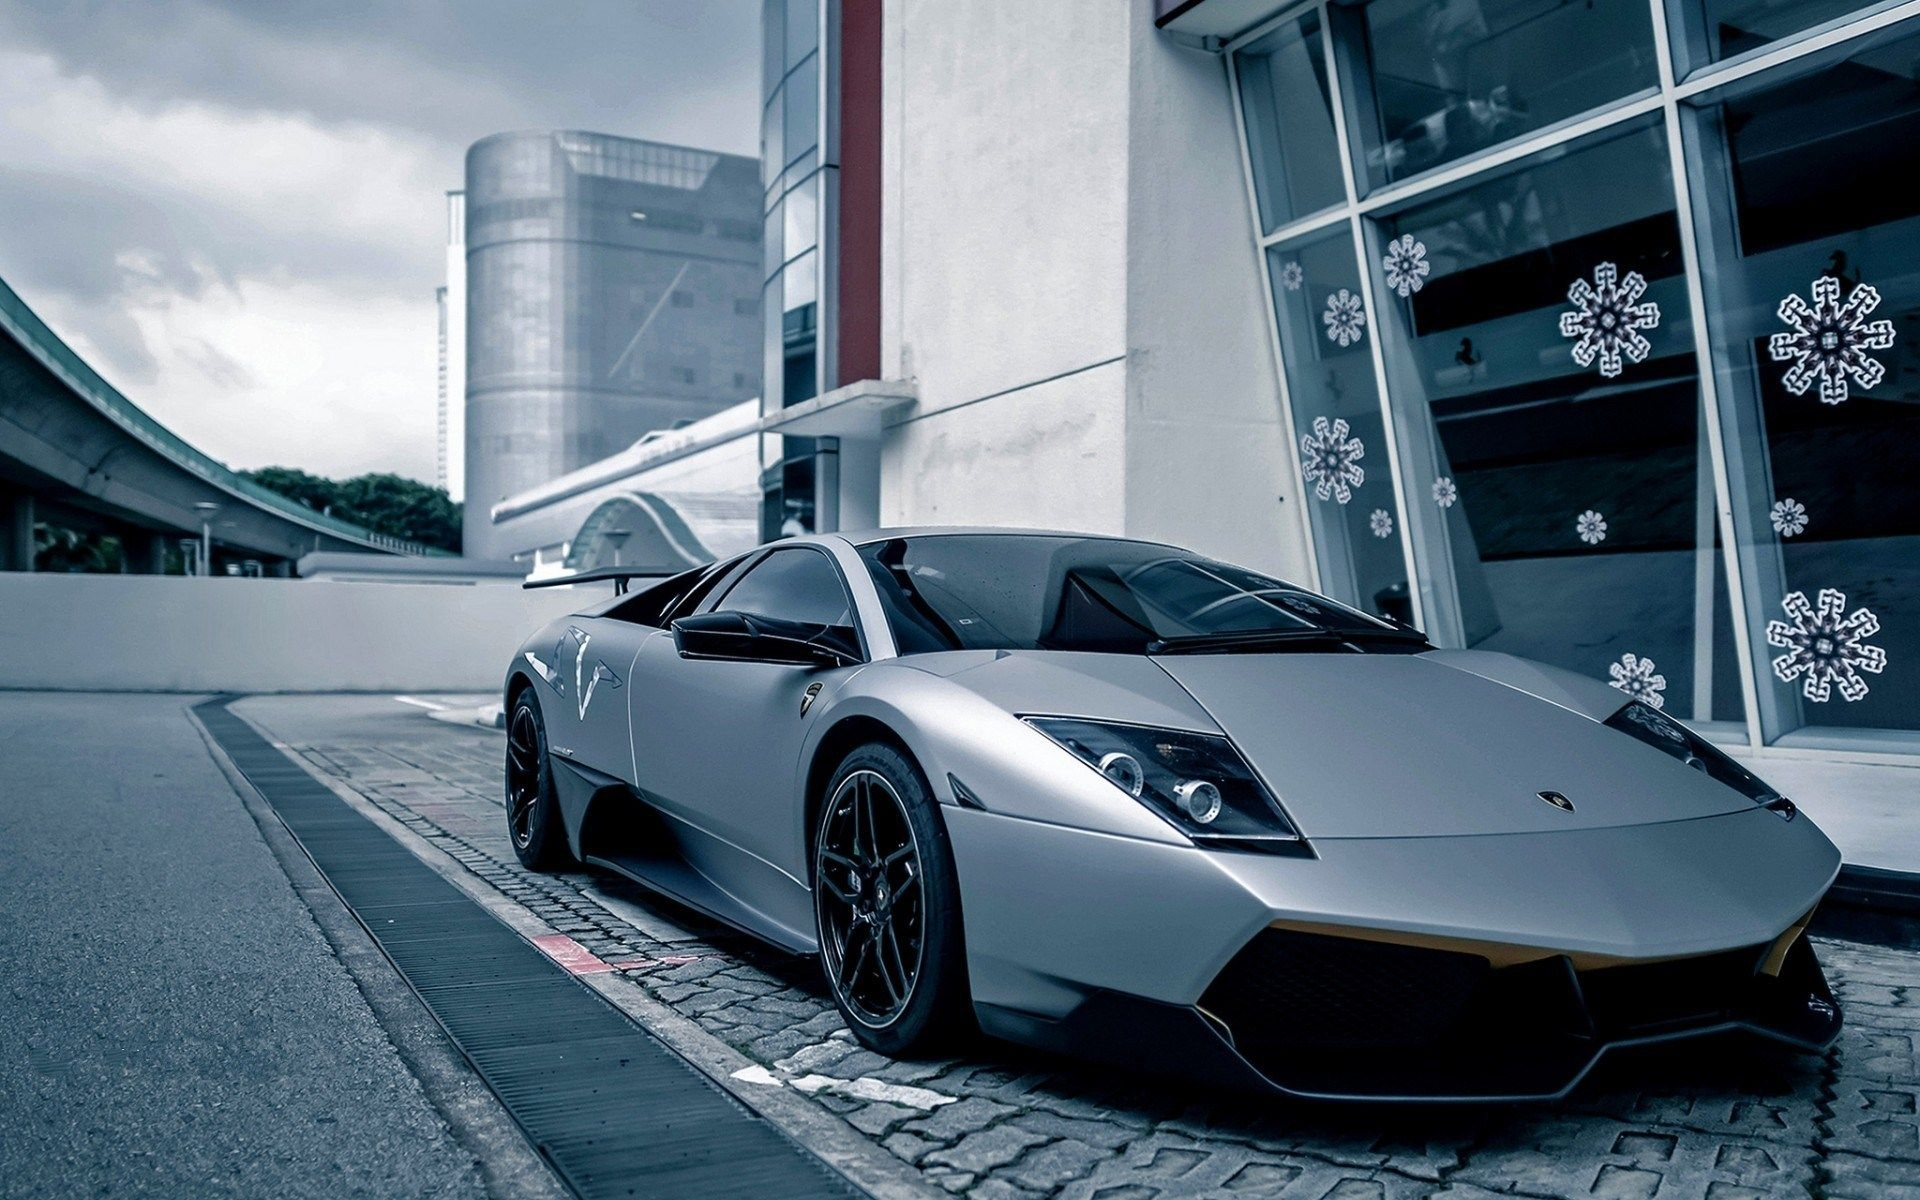 Lamborghini Wallpaper HD #wbv | Cars | Pinterest | Lamborghini, Wallpaper  And Wallpaper Backgrounds